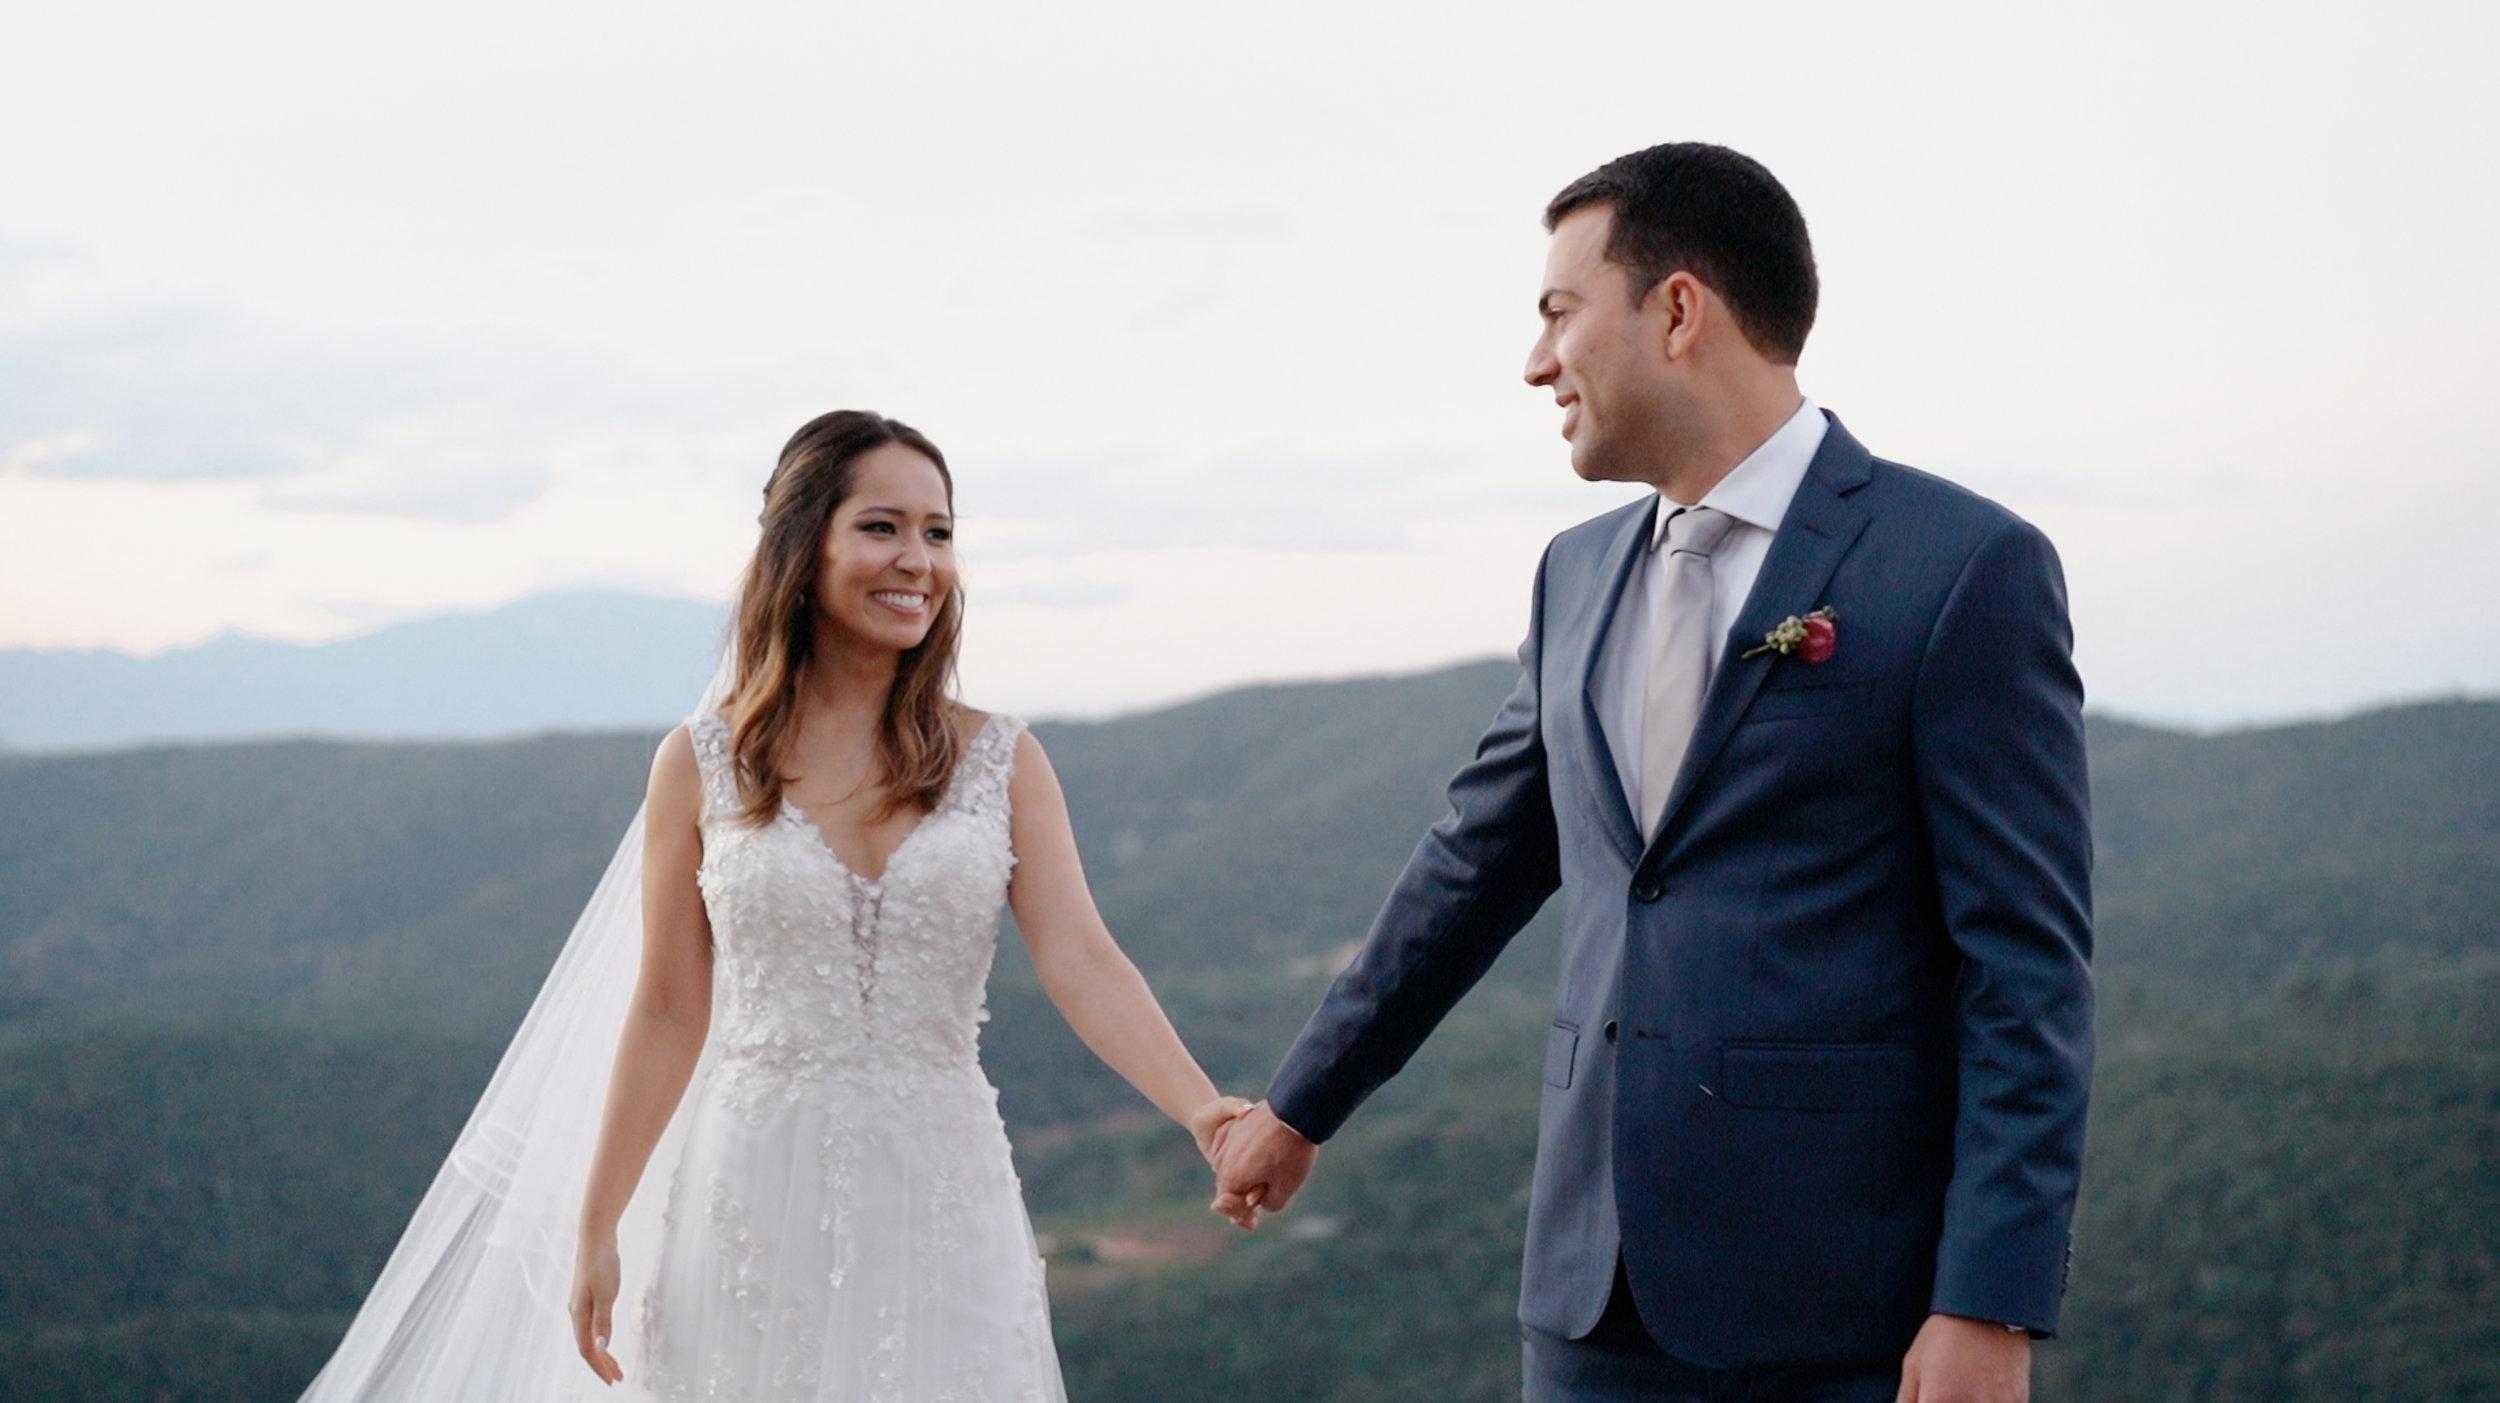 photographe-bruxelles-mariage-nicolasleleu4.jpg